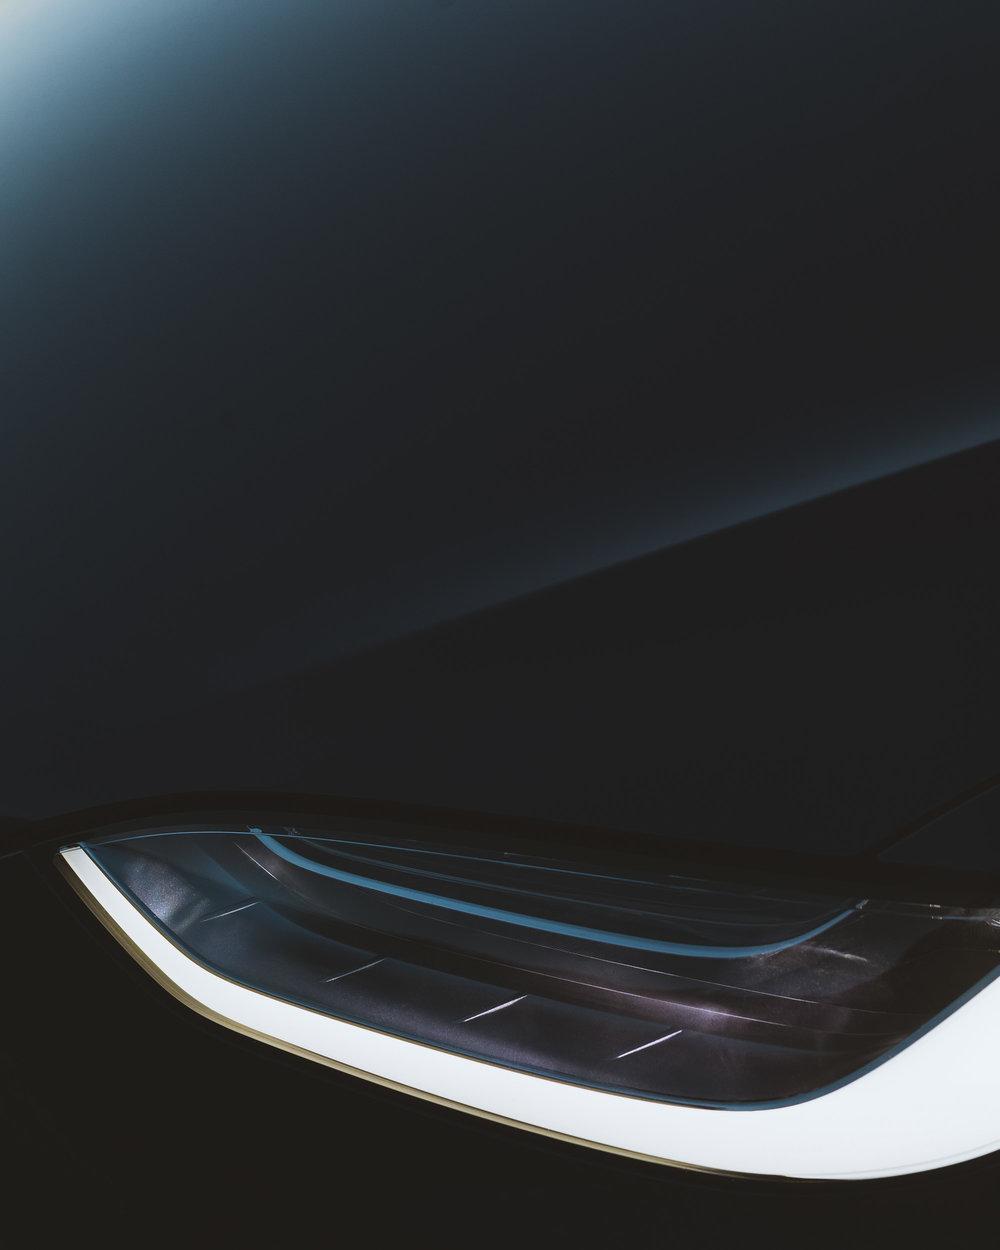 Tesla-Finn_Beales-4.jpg